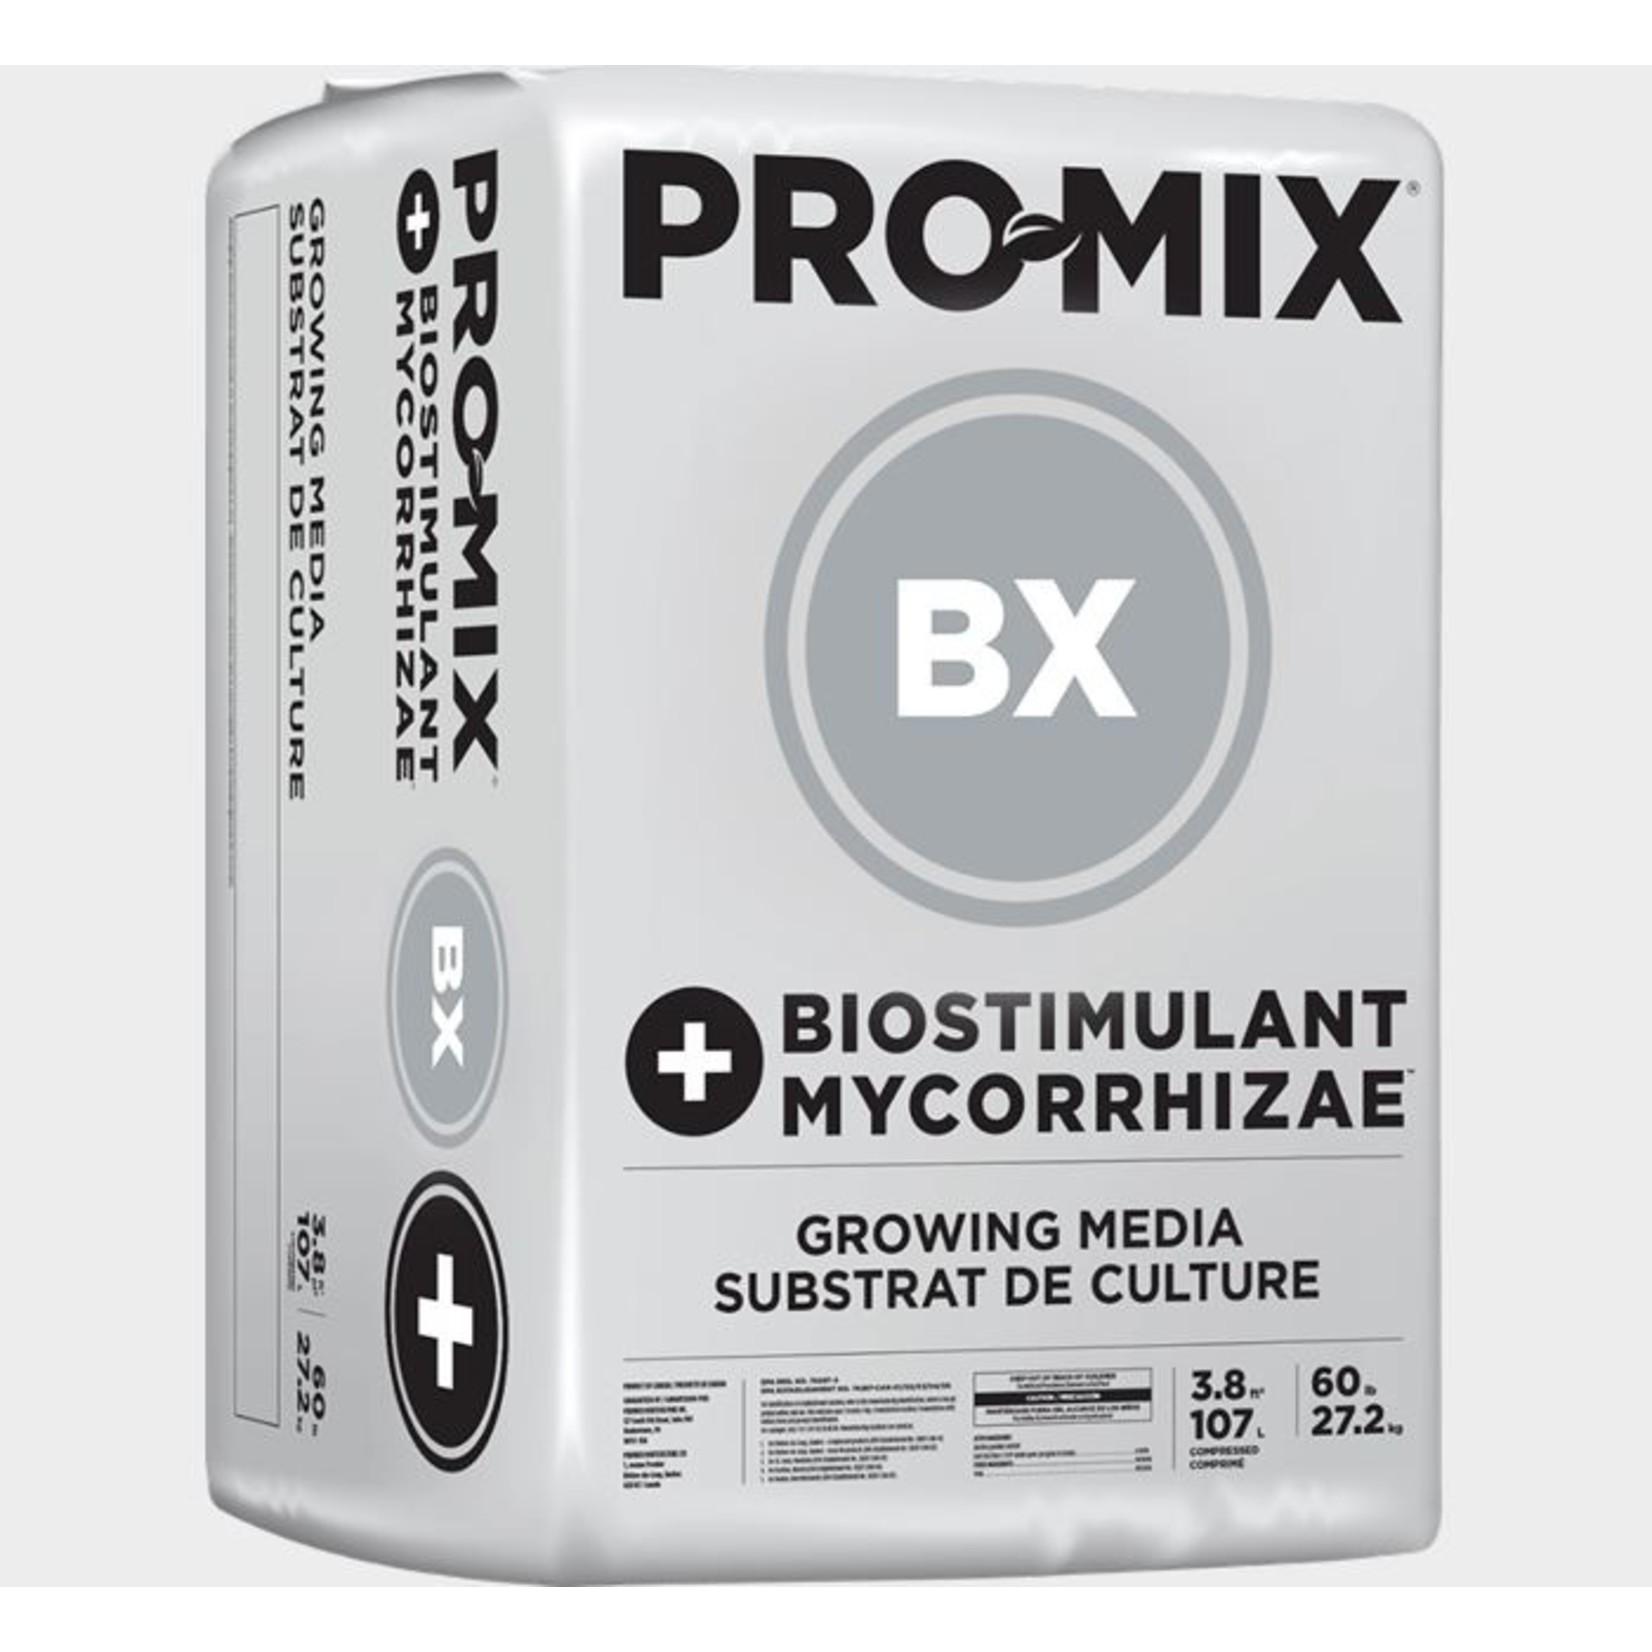 Promix PROMIX HP BIOSTIMULANT + MYCORRHIZAE